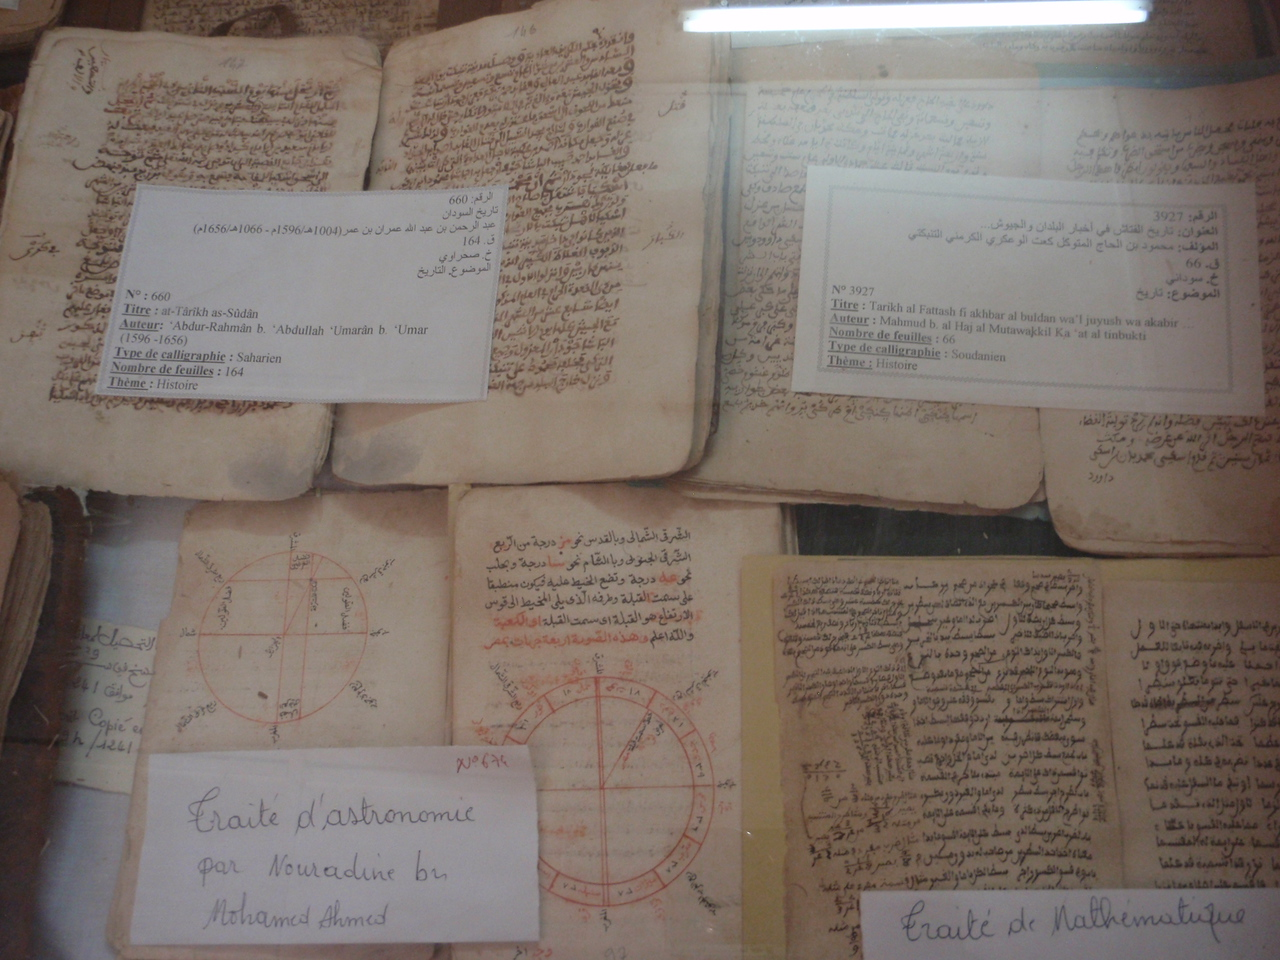 107_Timbuktu Manuscripts Project  Cooperation Univ  Oslo, Norway